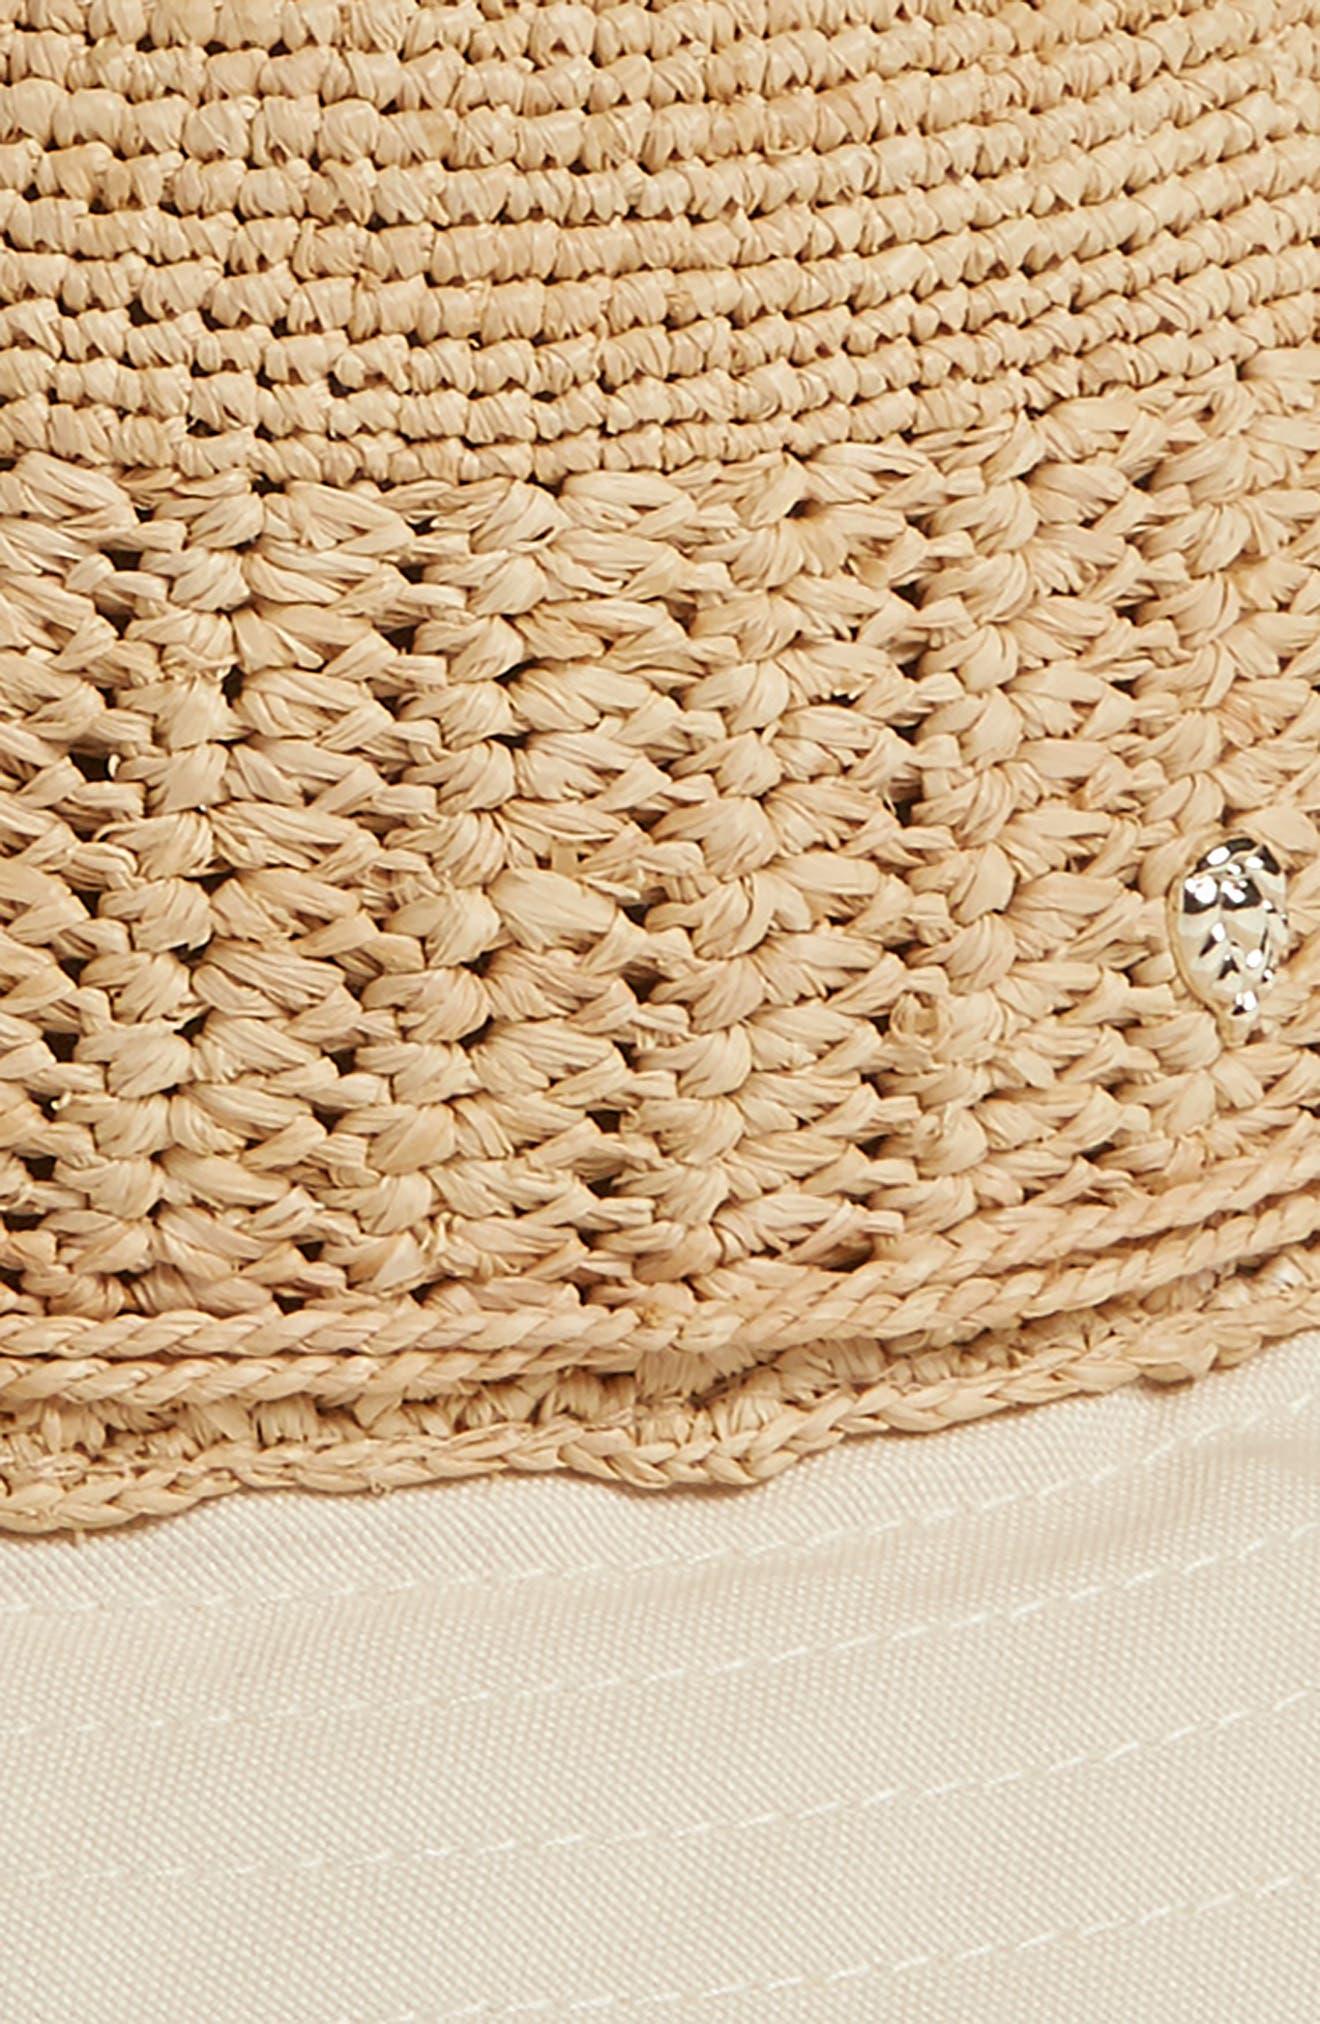 Cotton Brim Raffia Hat,                             Alternate thumbnail 2, color,                             Natural/ Shell